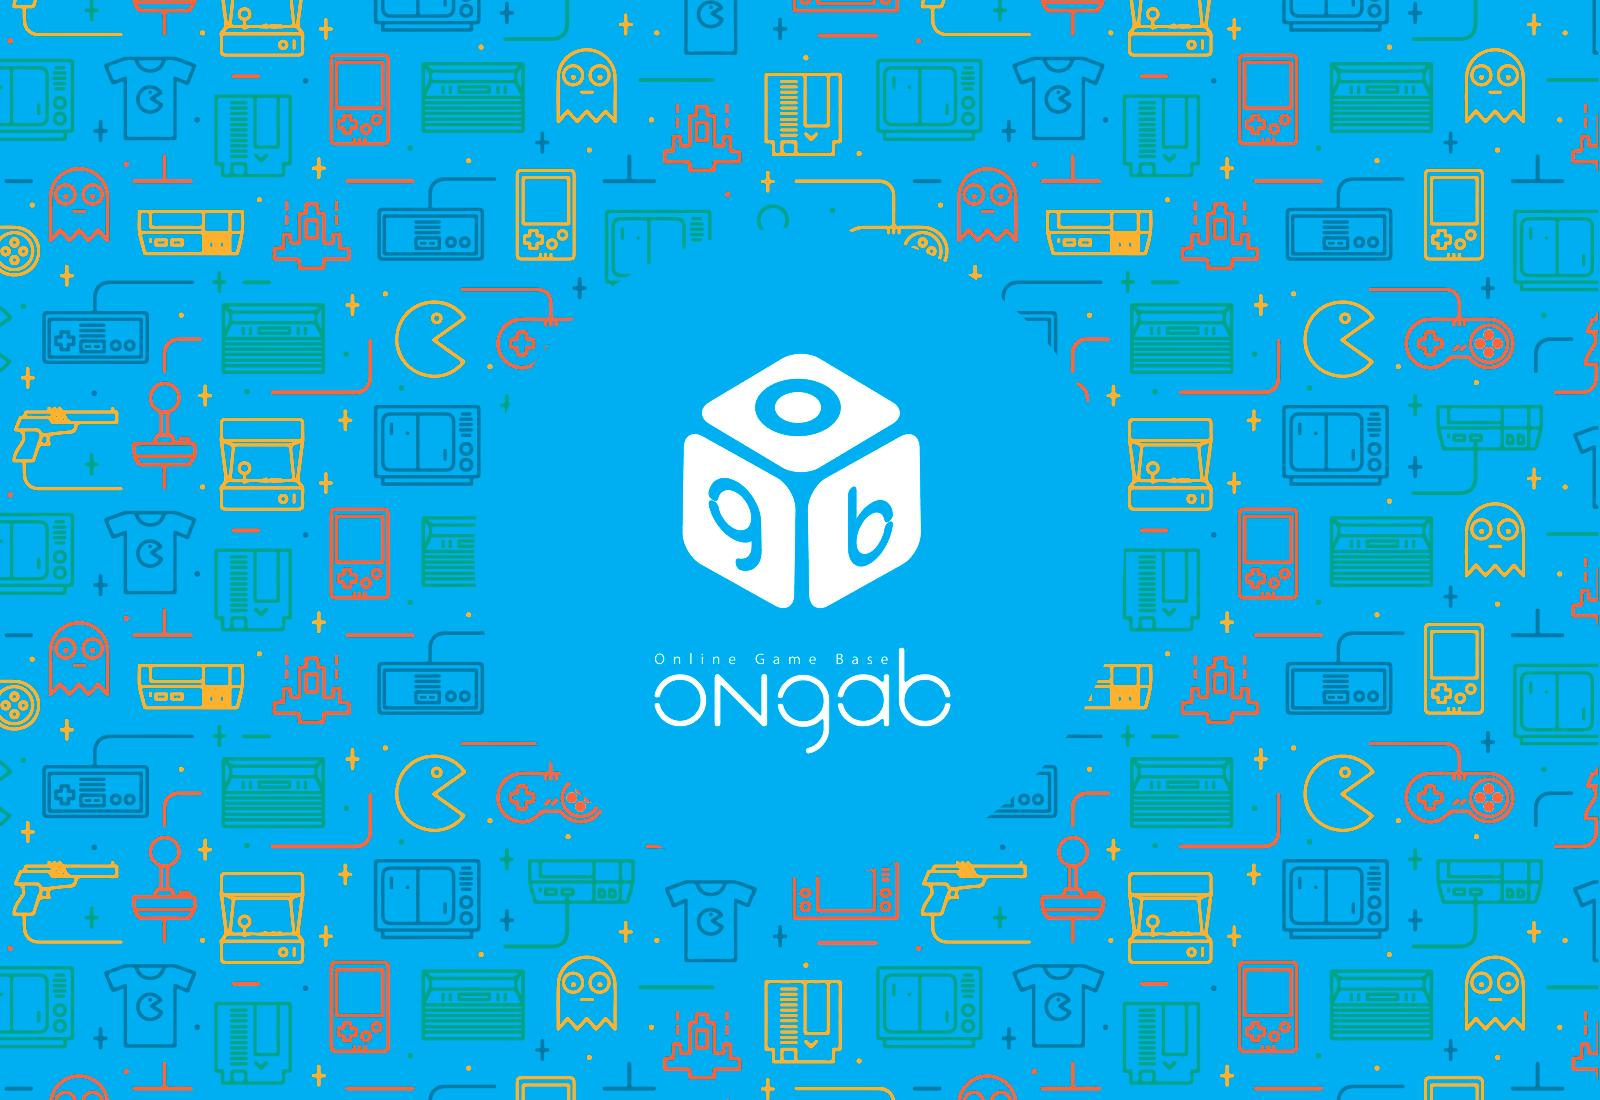 Руководство для Ongab.ru